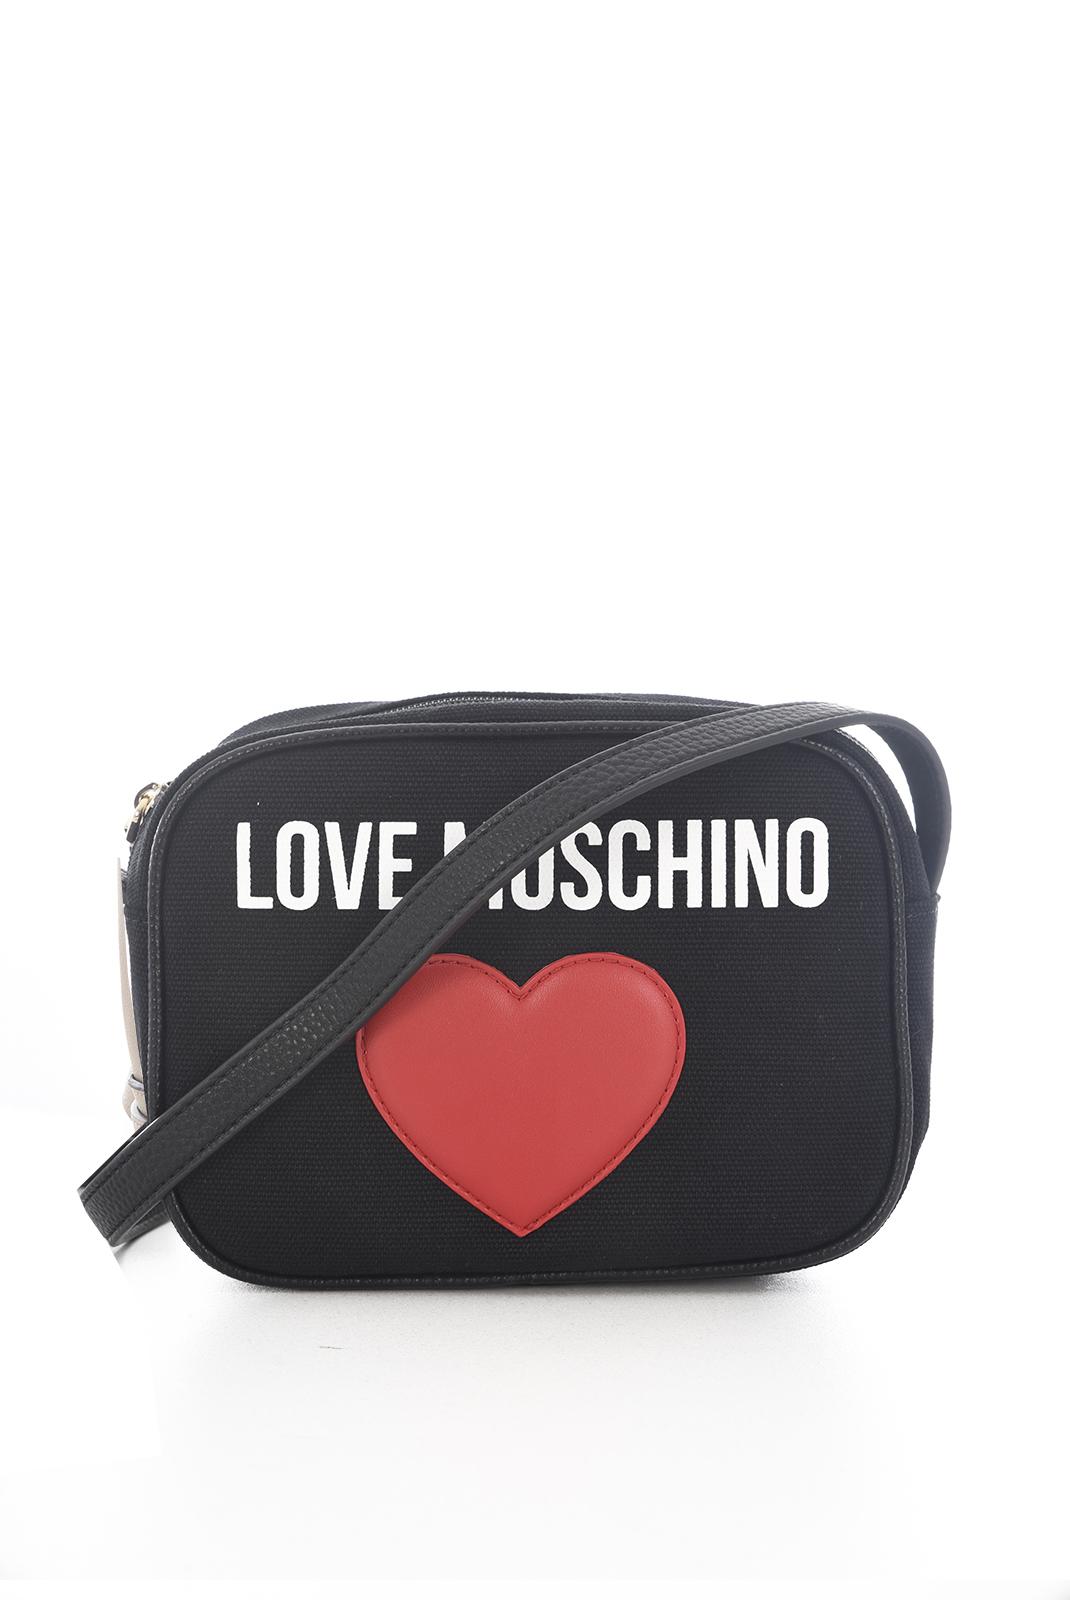 Besaces / Sacs bandoulière  Love moschino JC4138PP15 BORSA CANVAS NERO PEBBLE